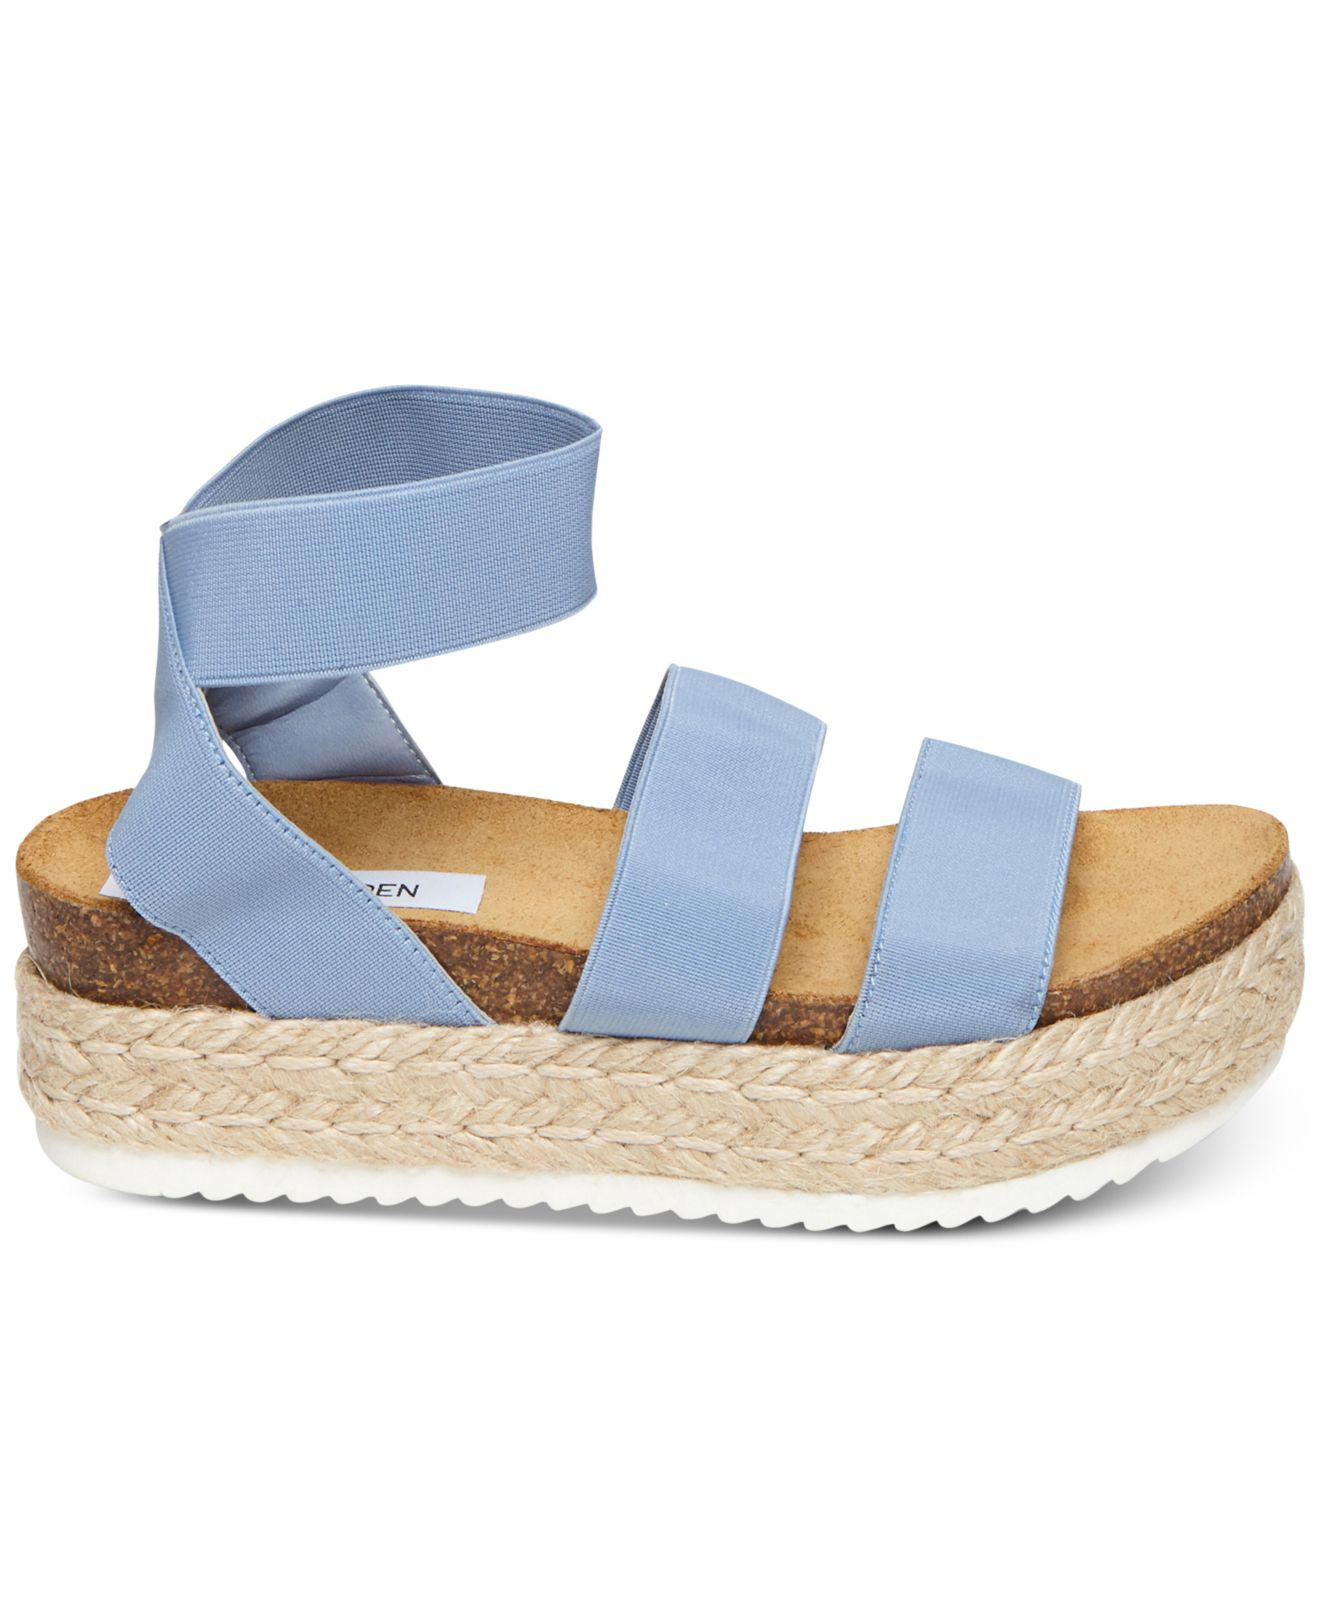 f9d37b06730 Lyst - Steve Madden Kimmie Flatform Espadrille Sandals in Blue